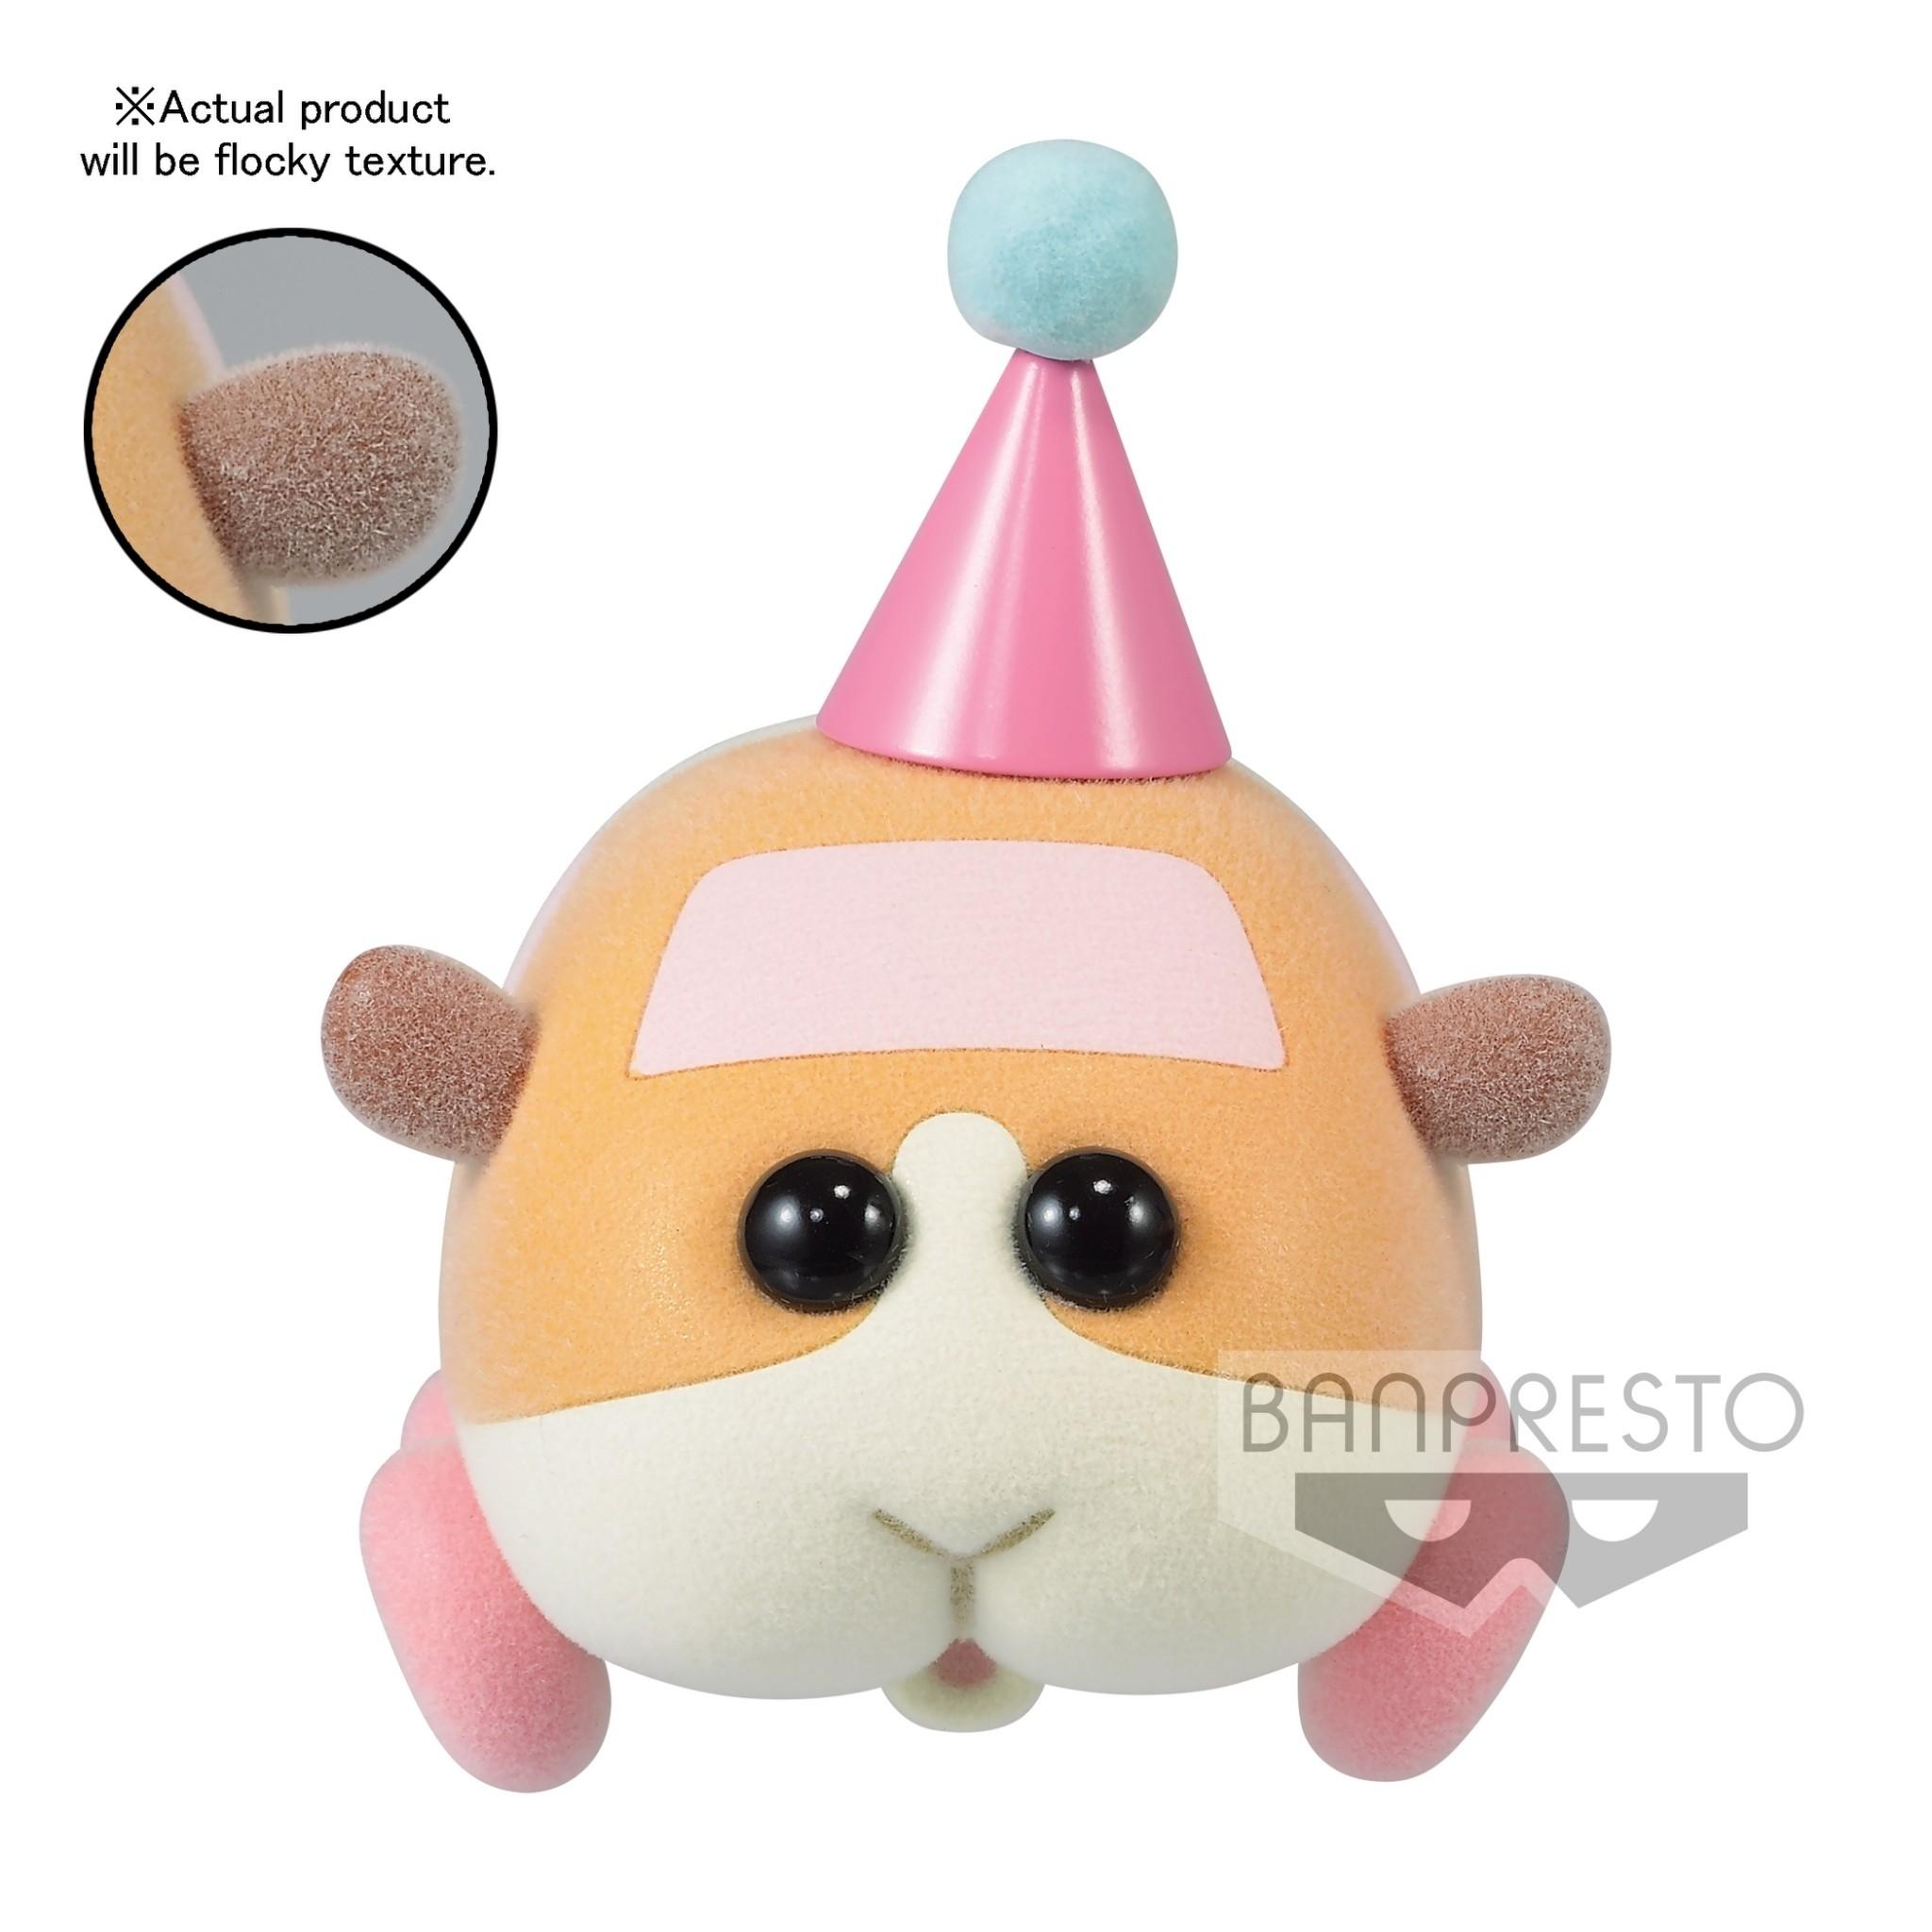 BANPRESTO|天竺鼠車車 Fluffy Puffy 馬鈴薯&巧克力 (A:馬鈴薯)